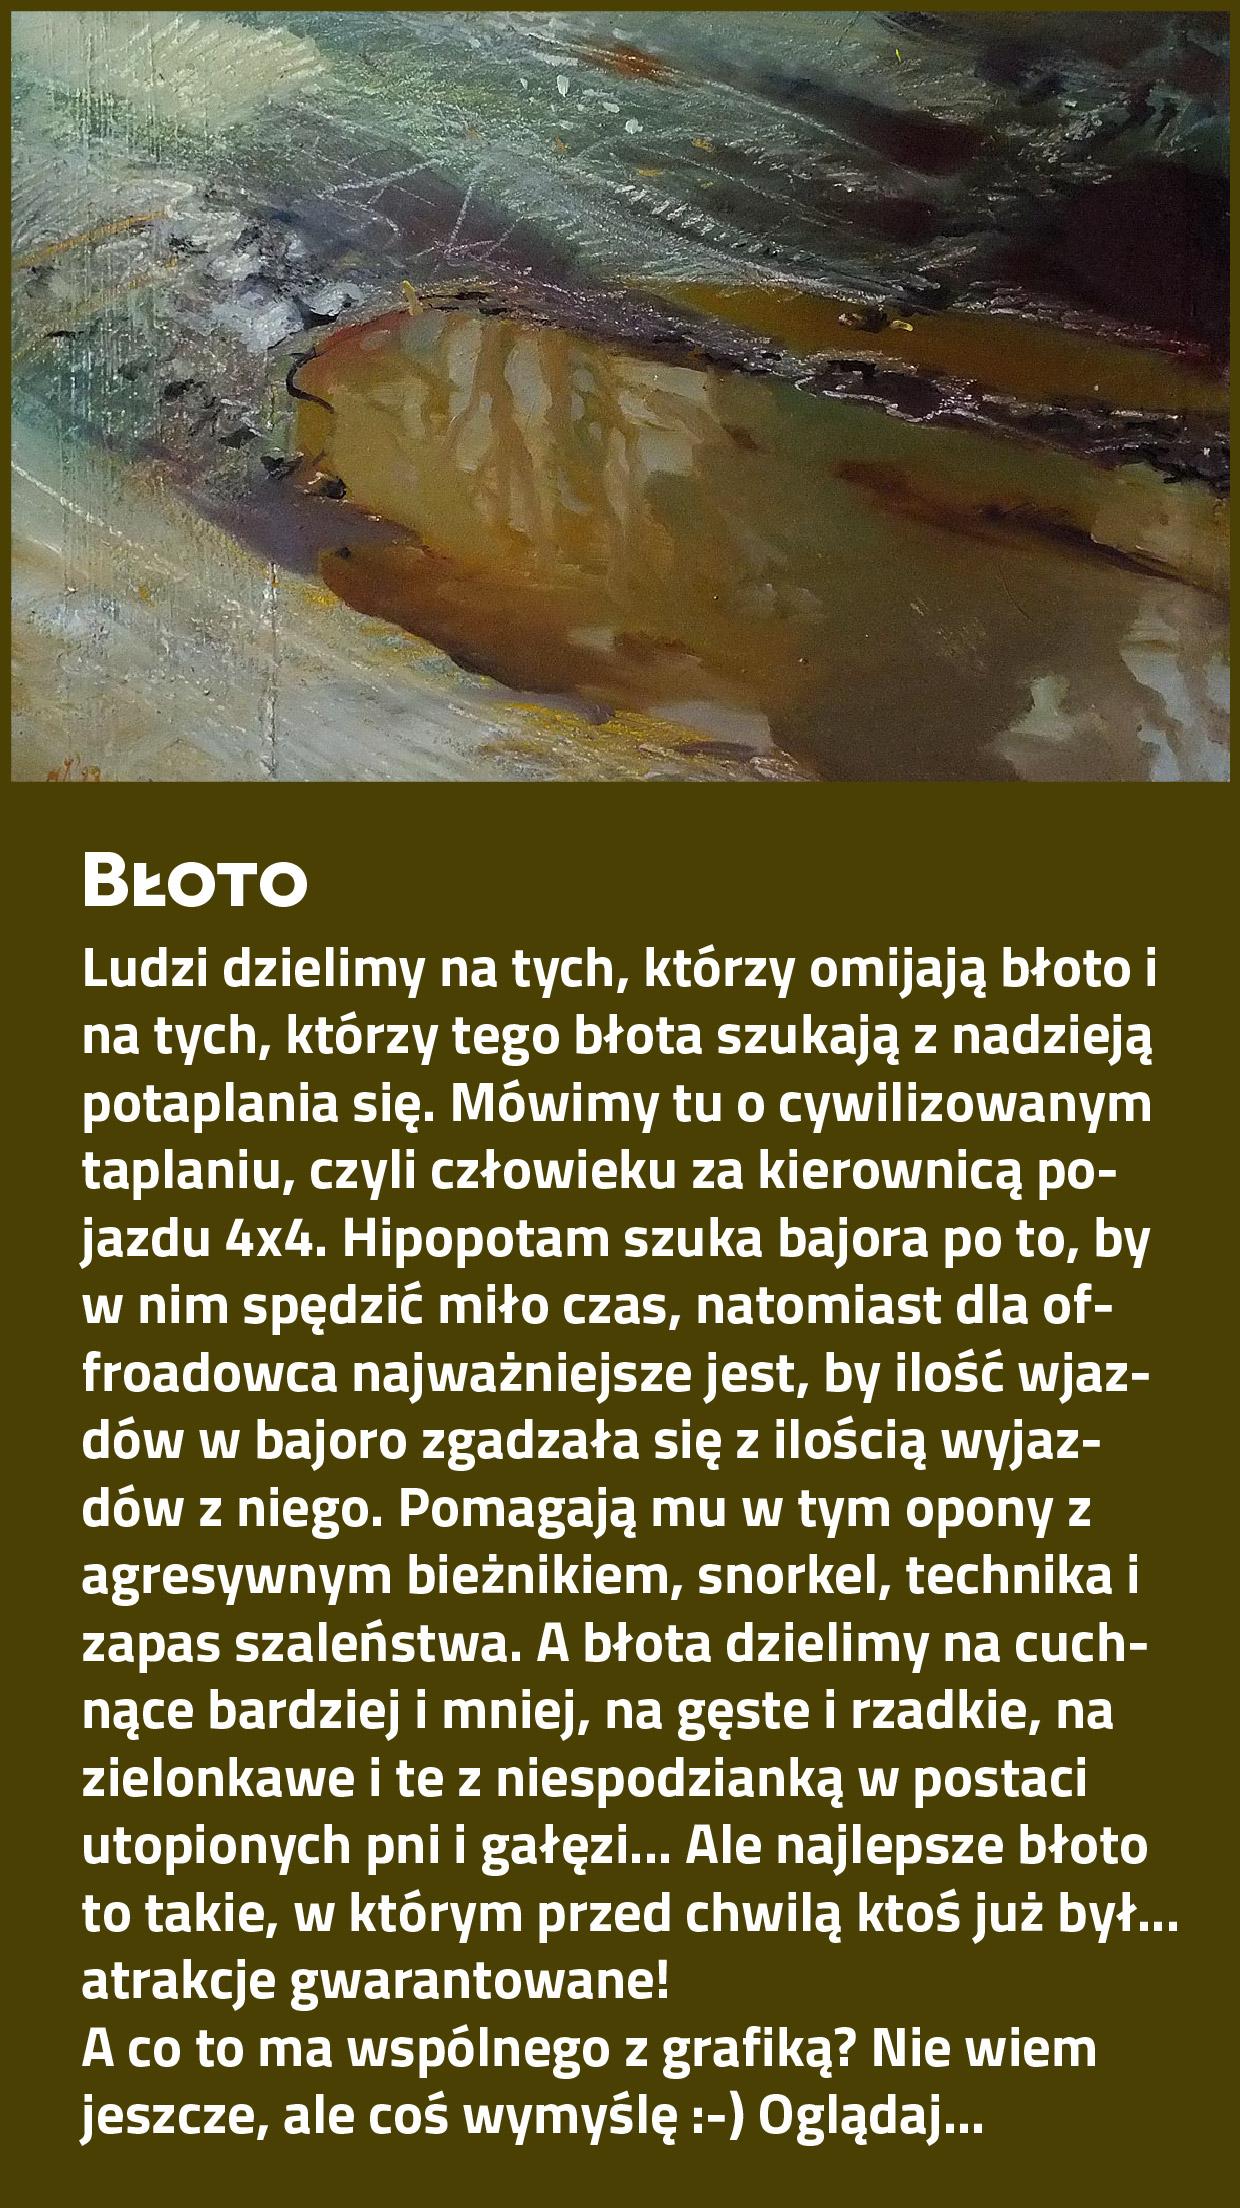 inspiracje_bloto-10